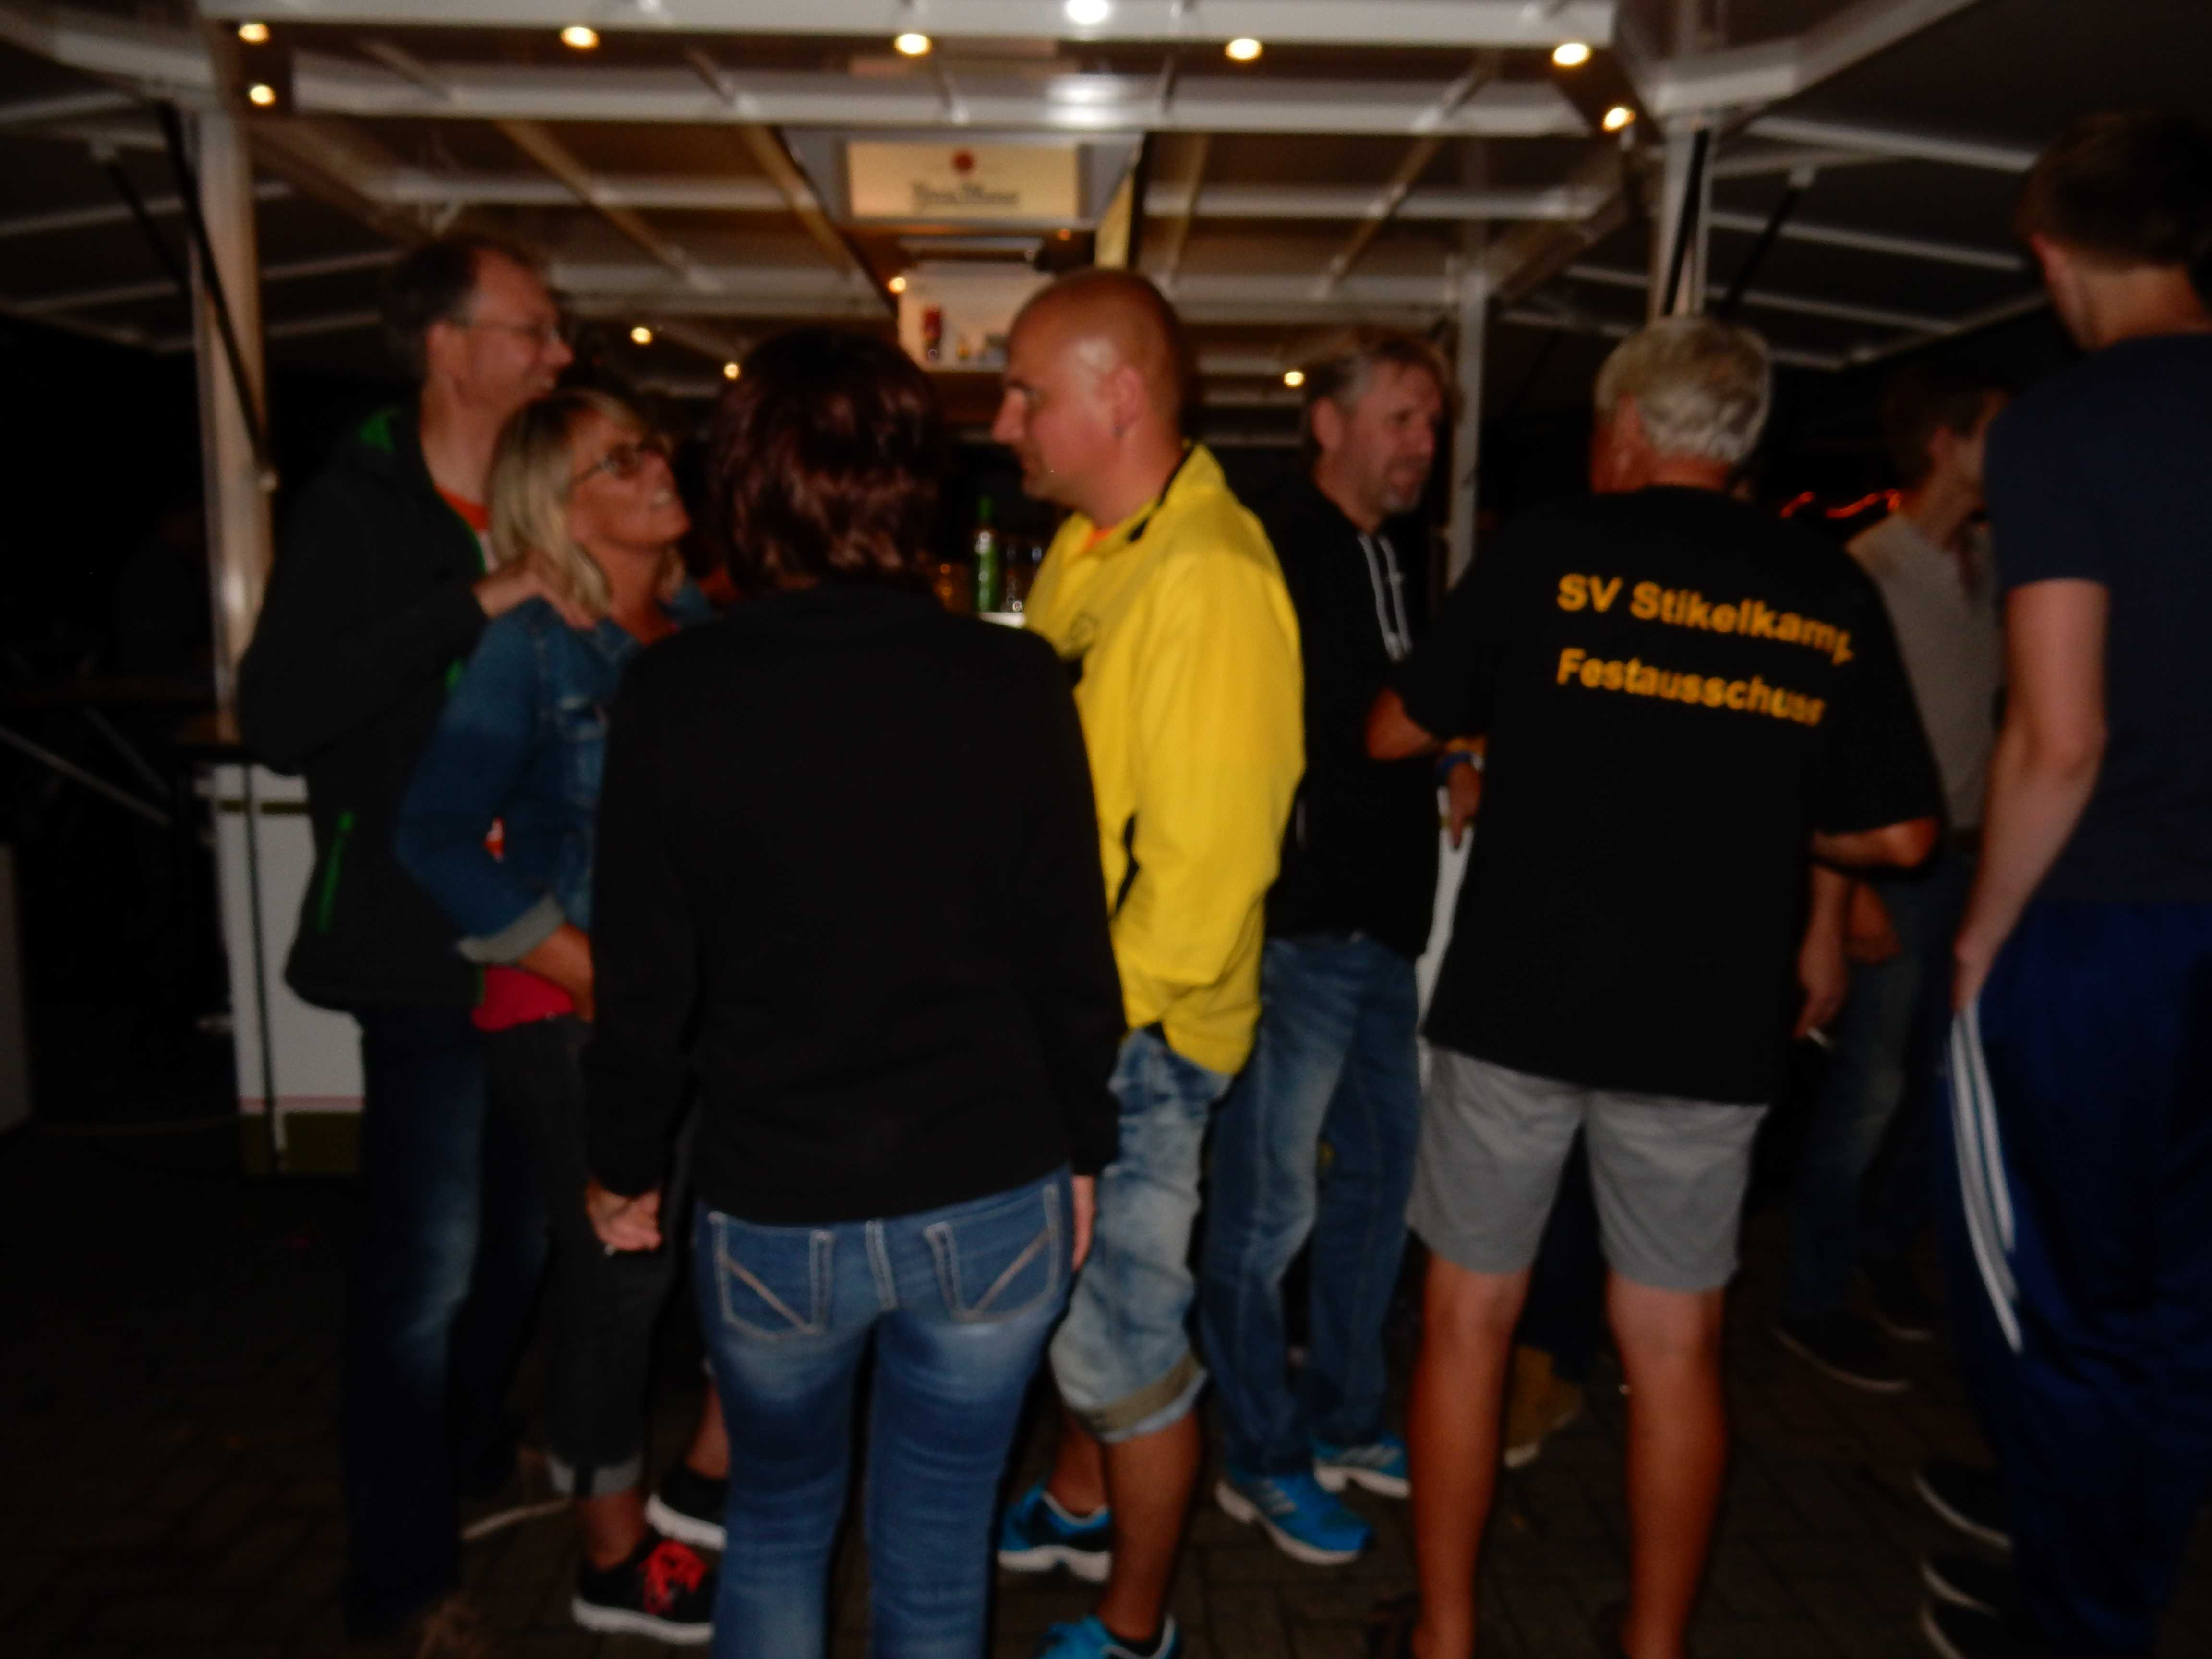 2016-07-29 Sportwoche - erster Freitag (133)